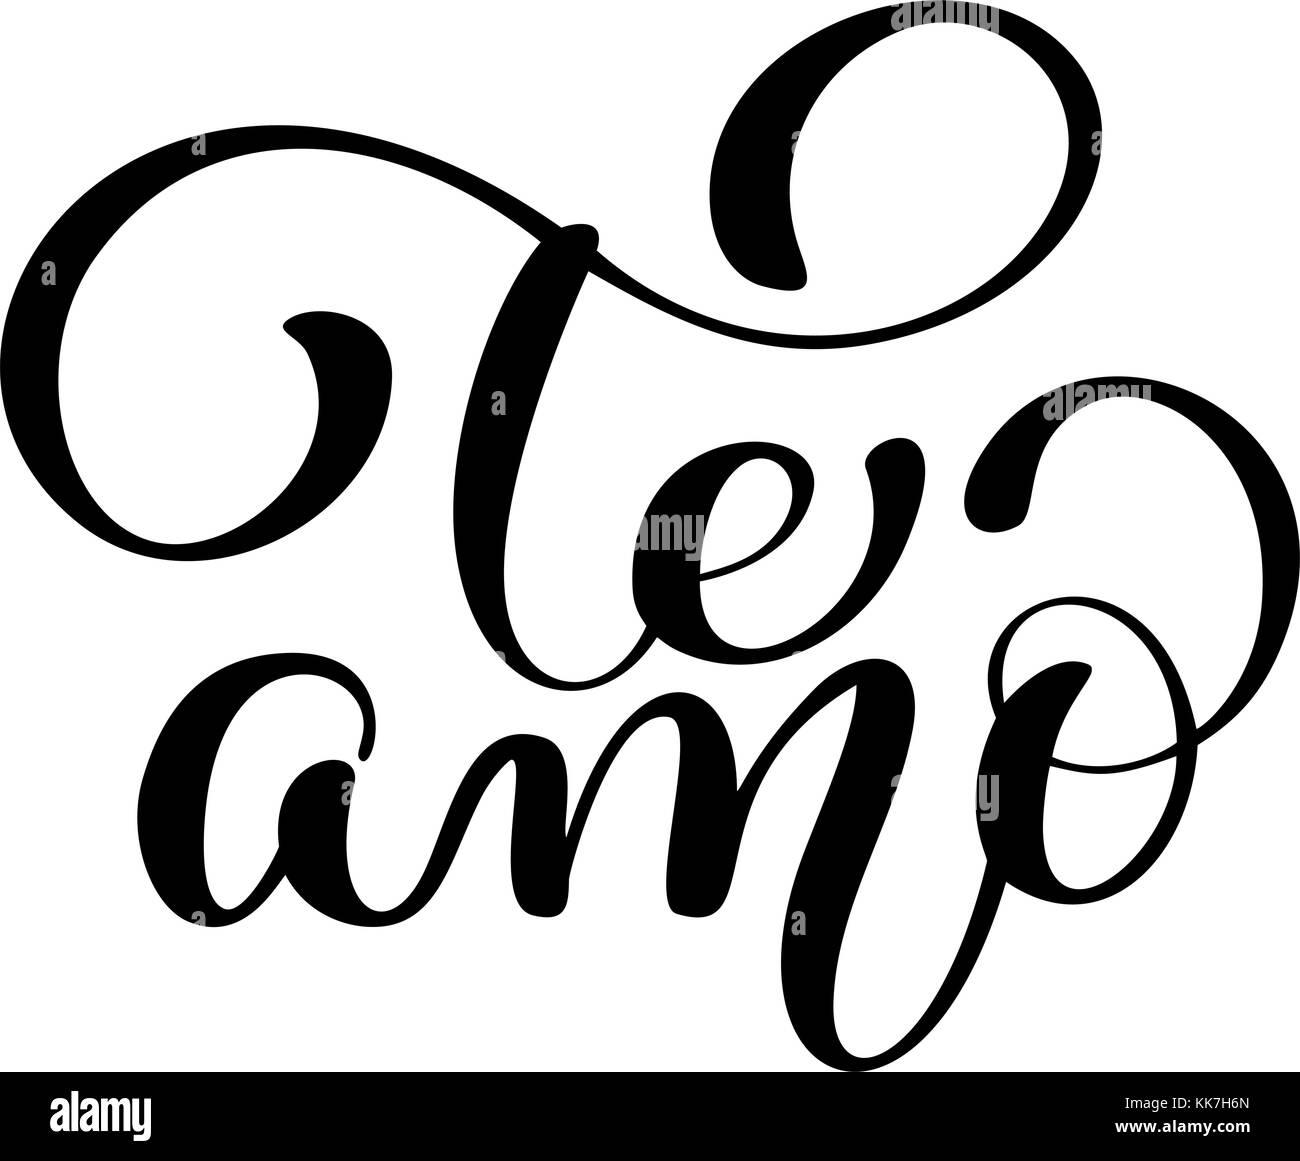 Spanish Love Text